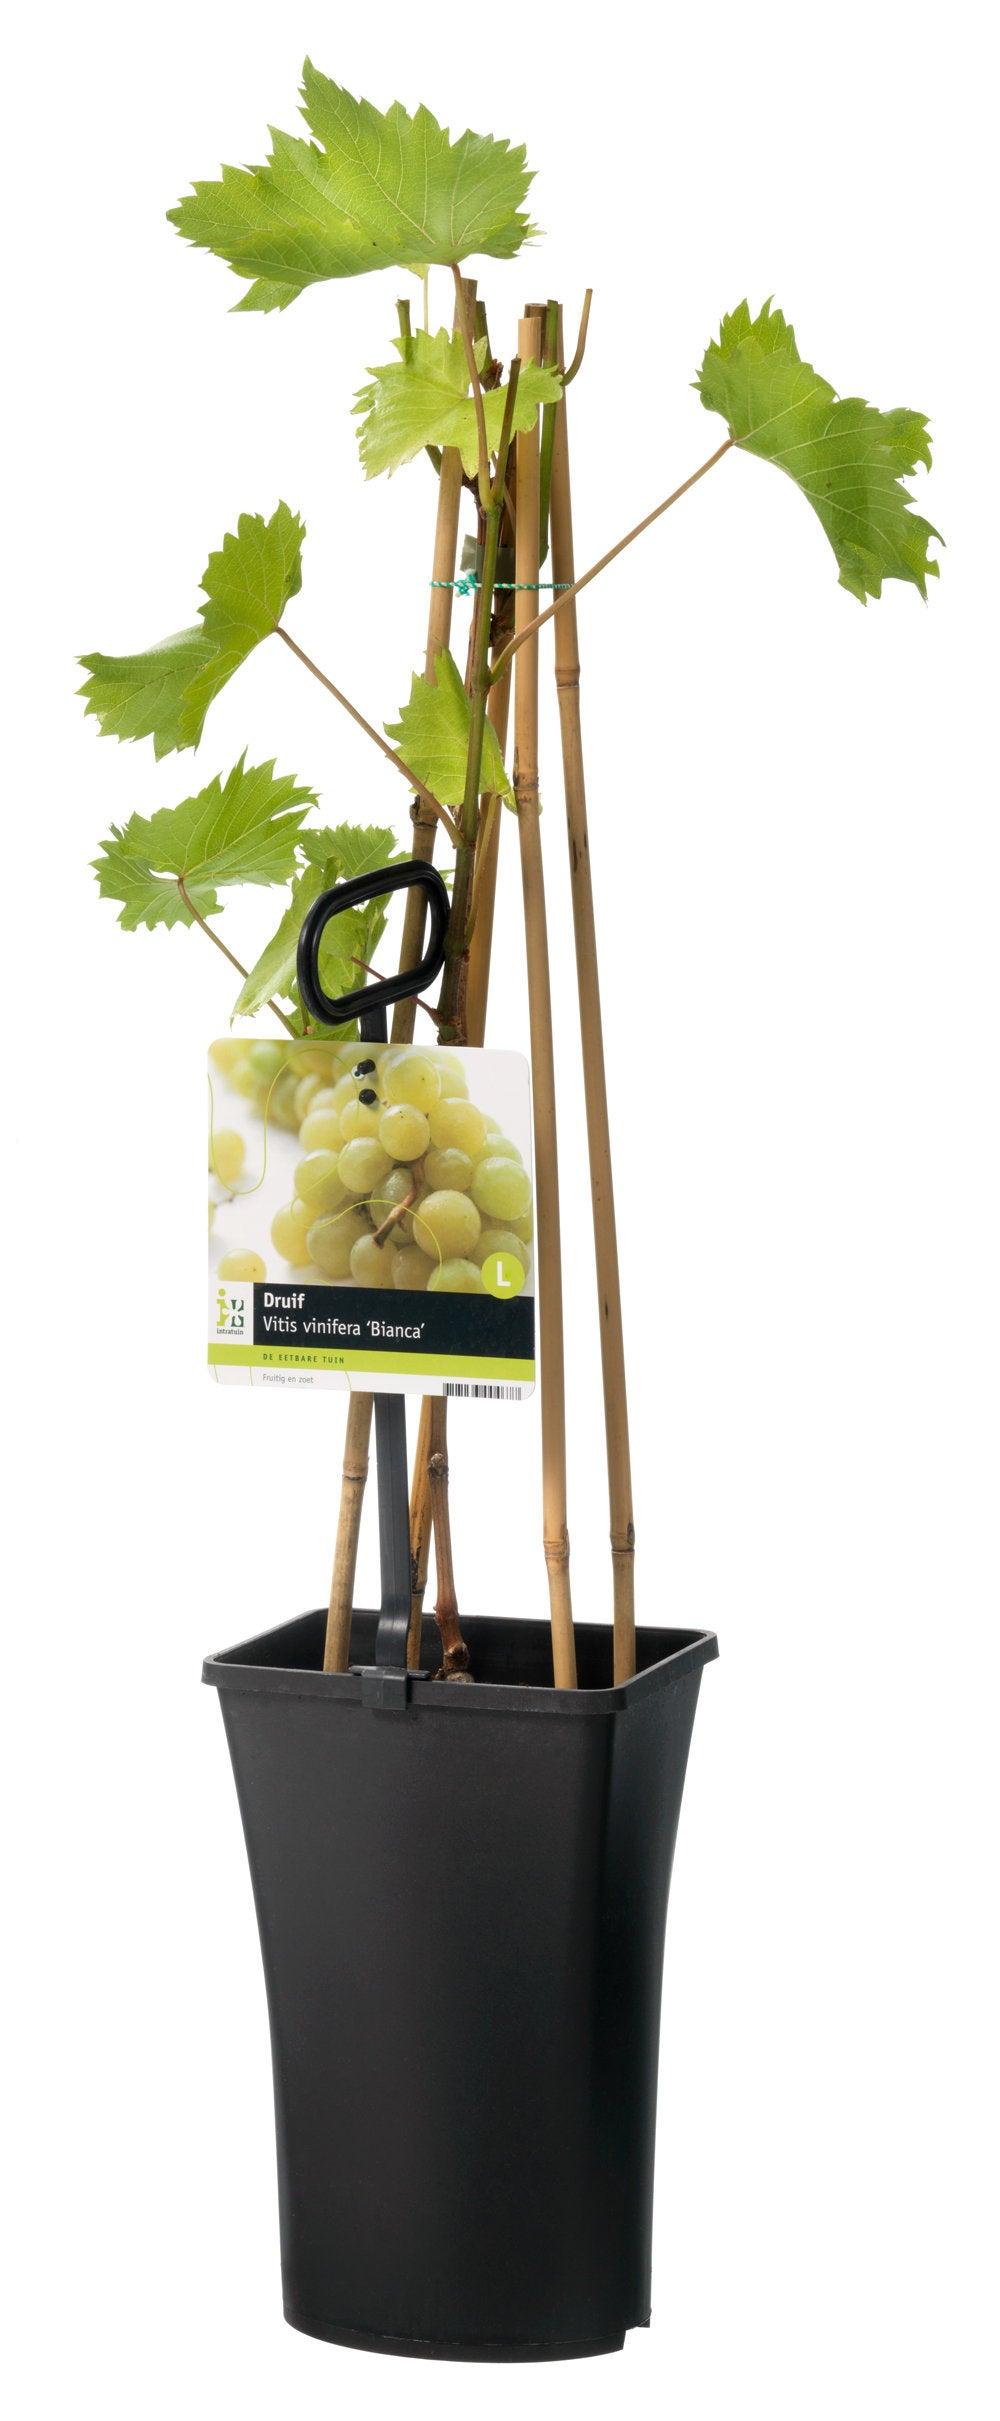 Witte druif (Vitis vinifera 'Bianca')